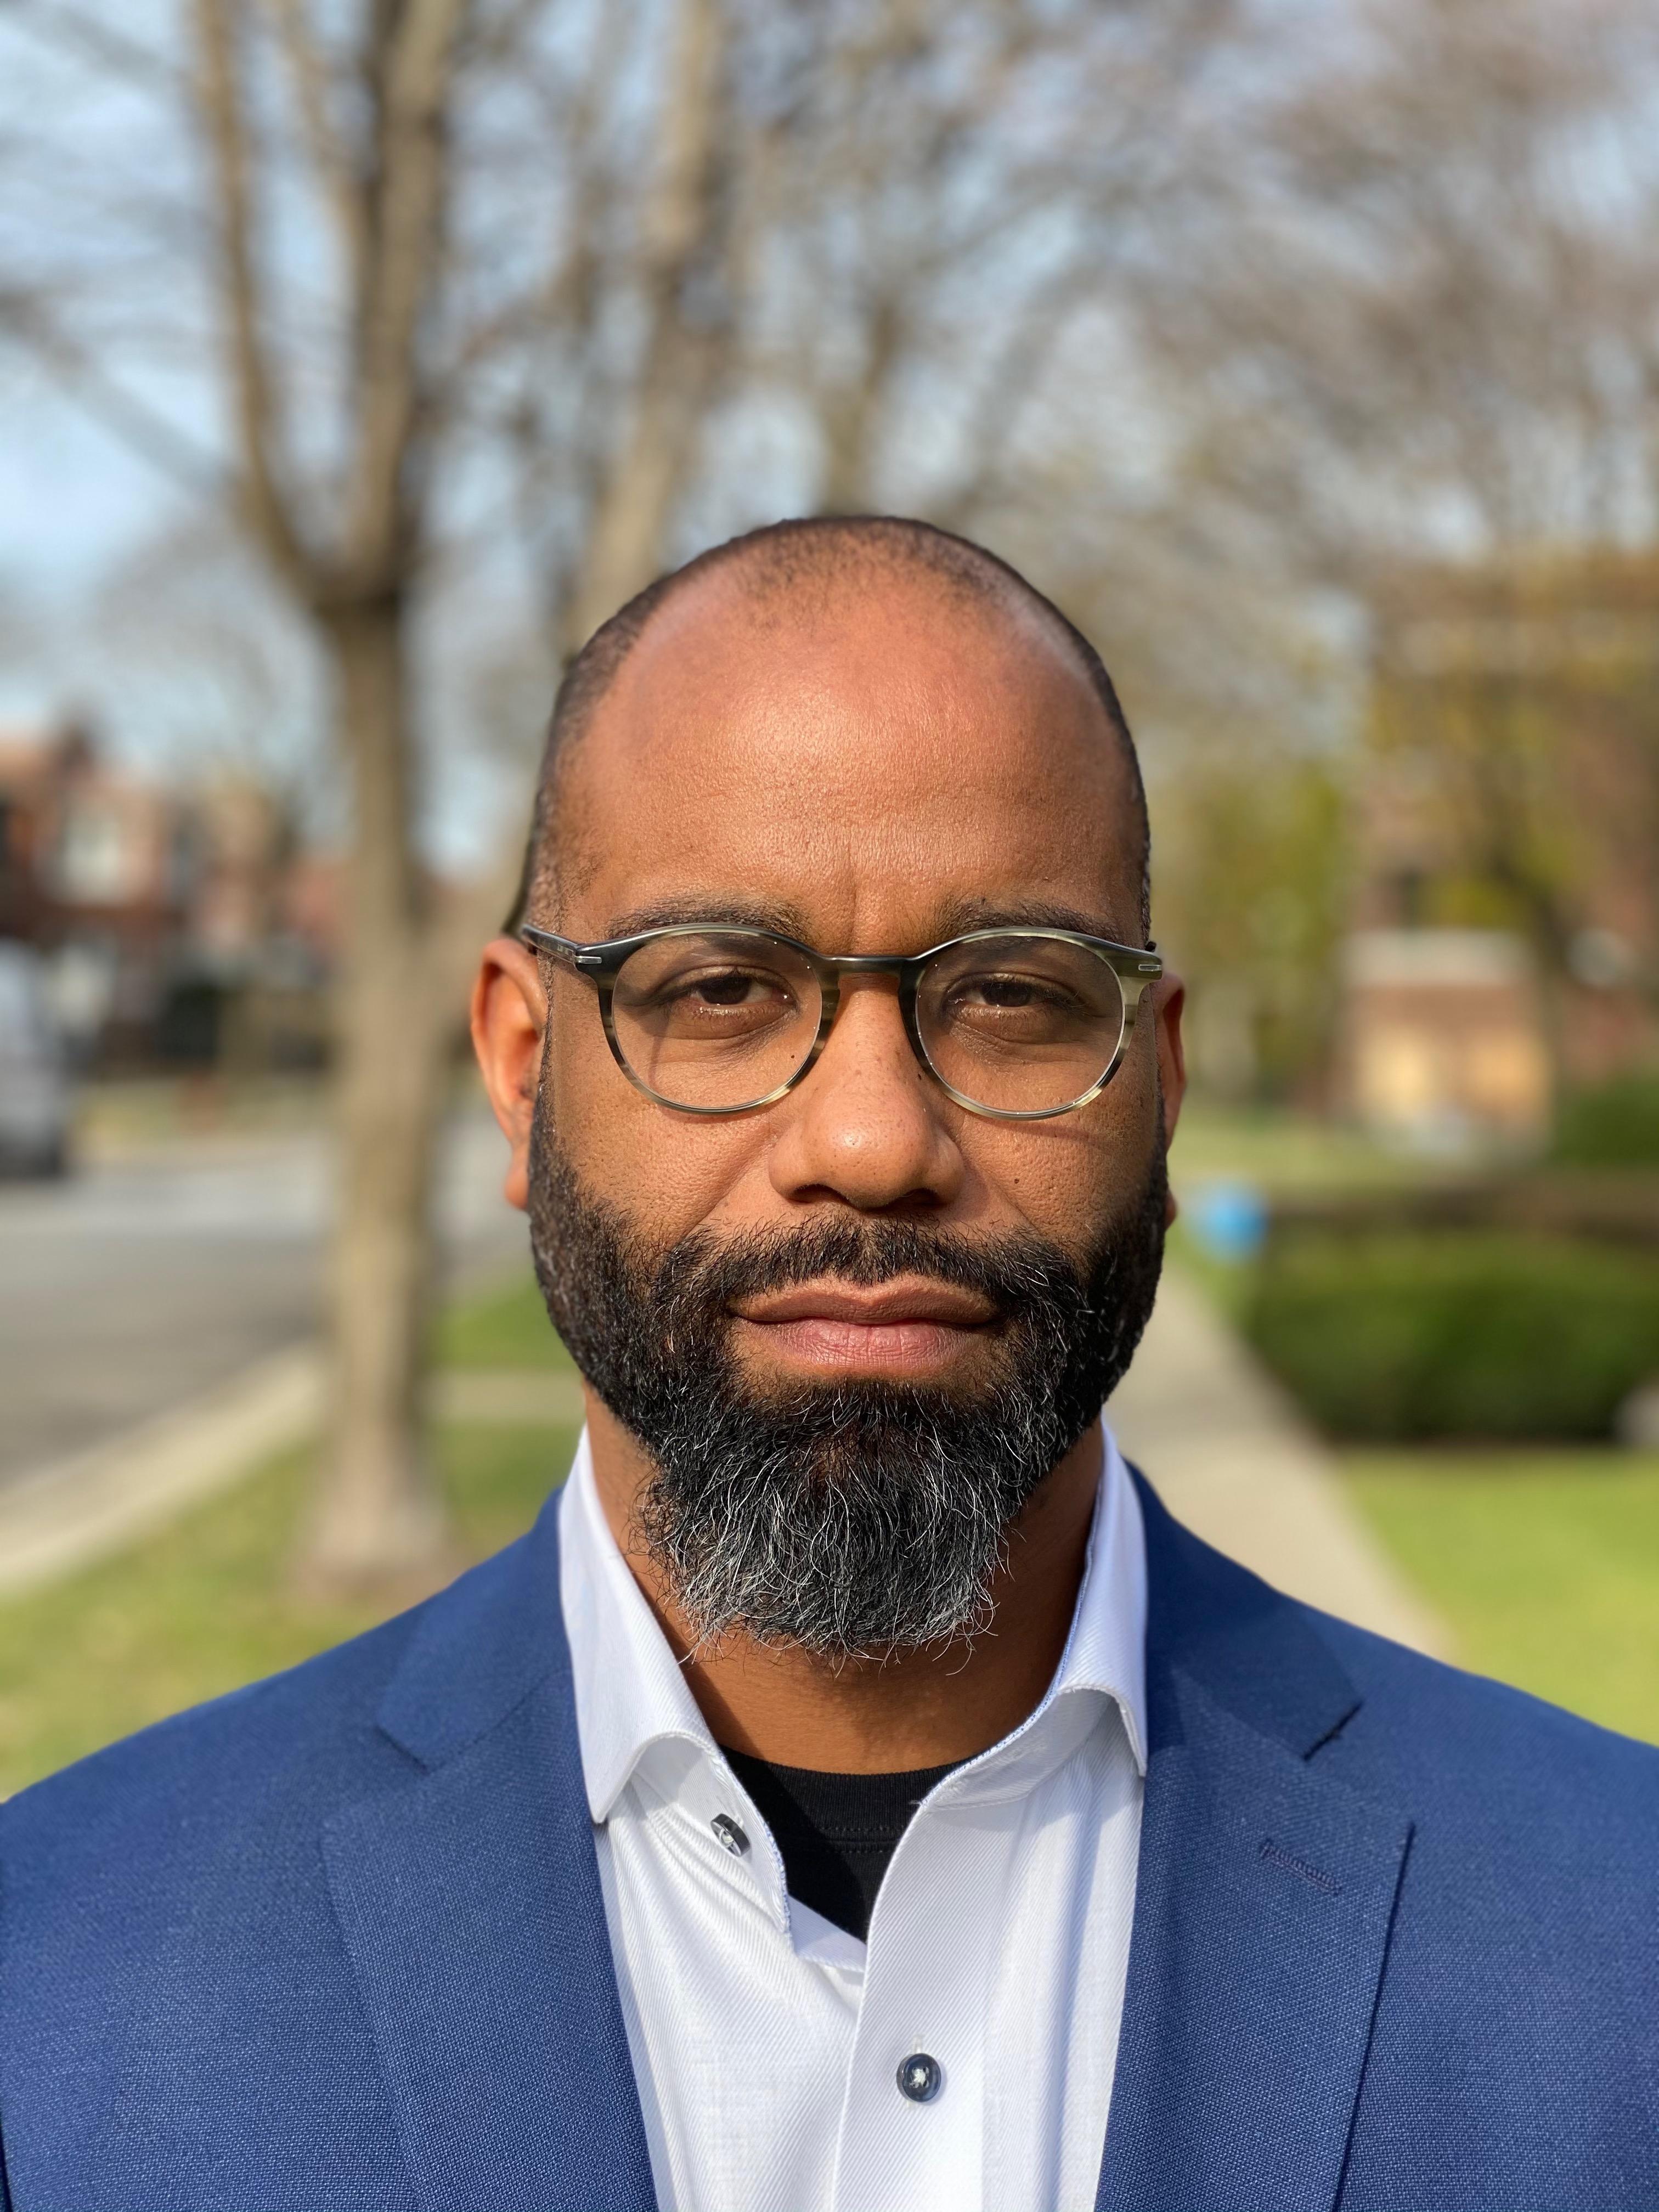 Dr. Reuben Jonathan Miller